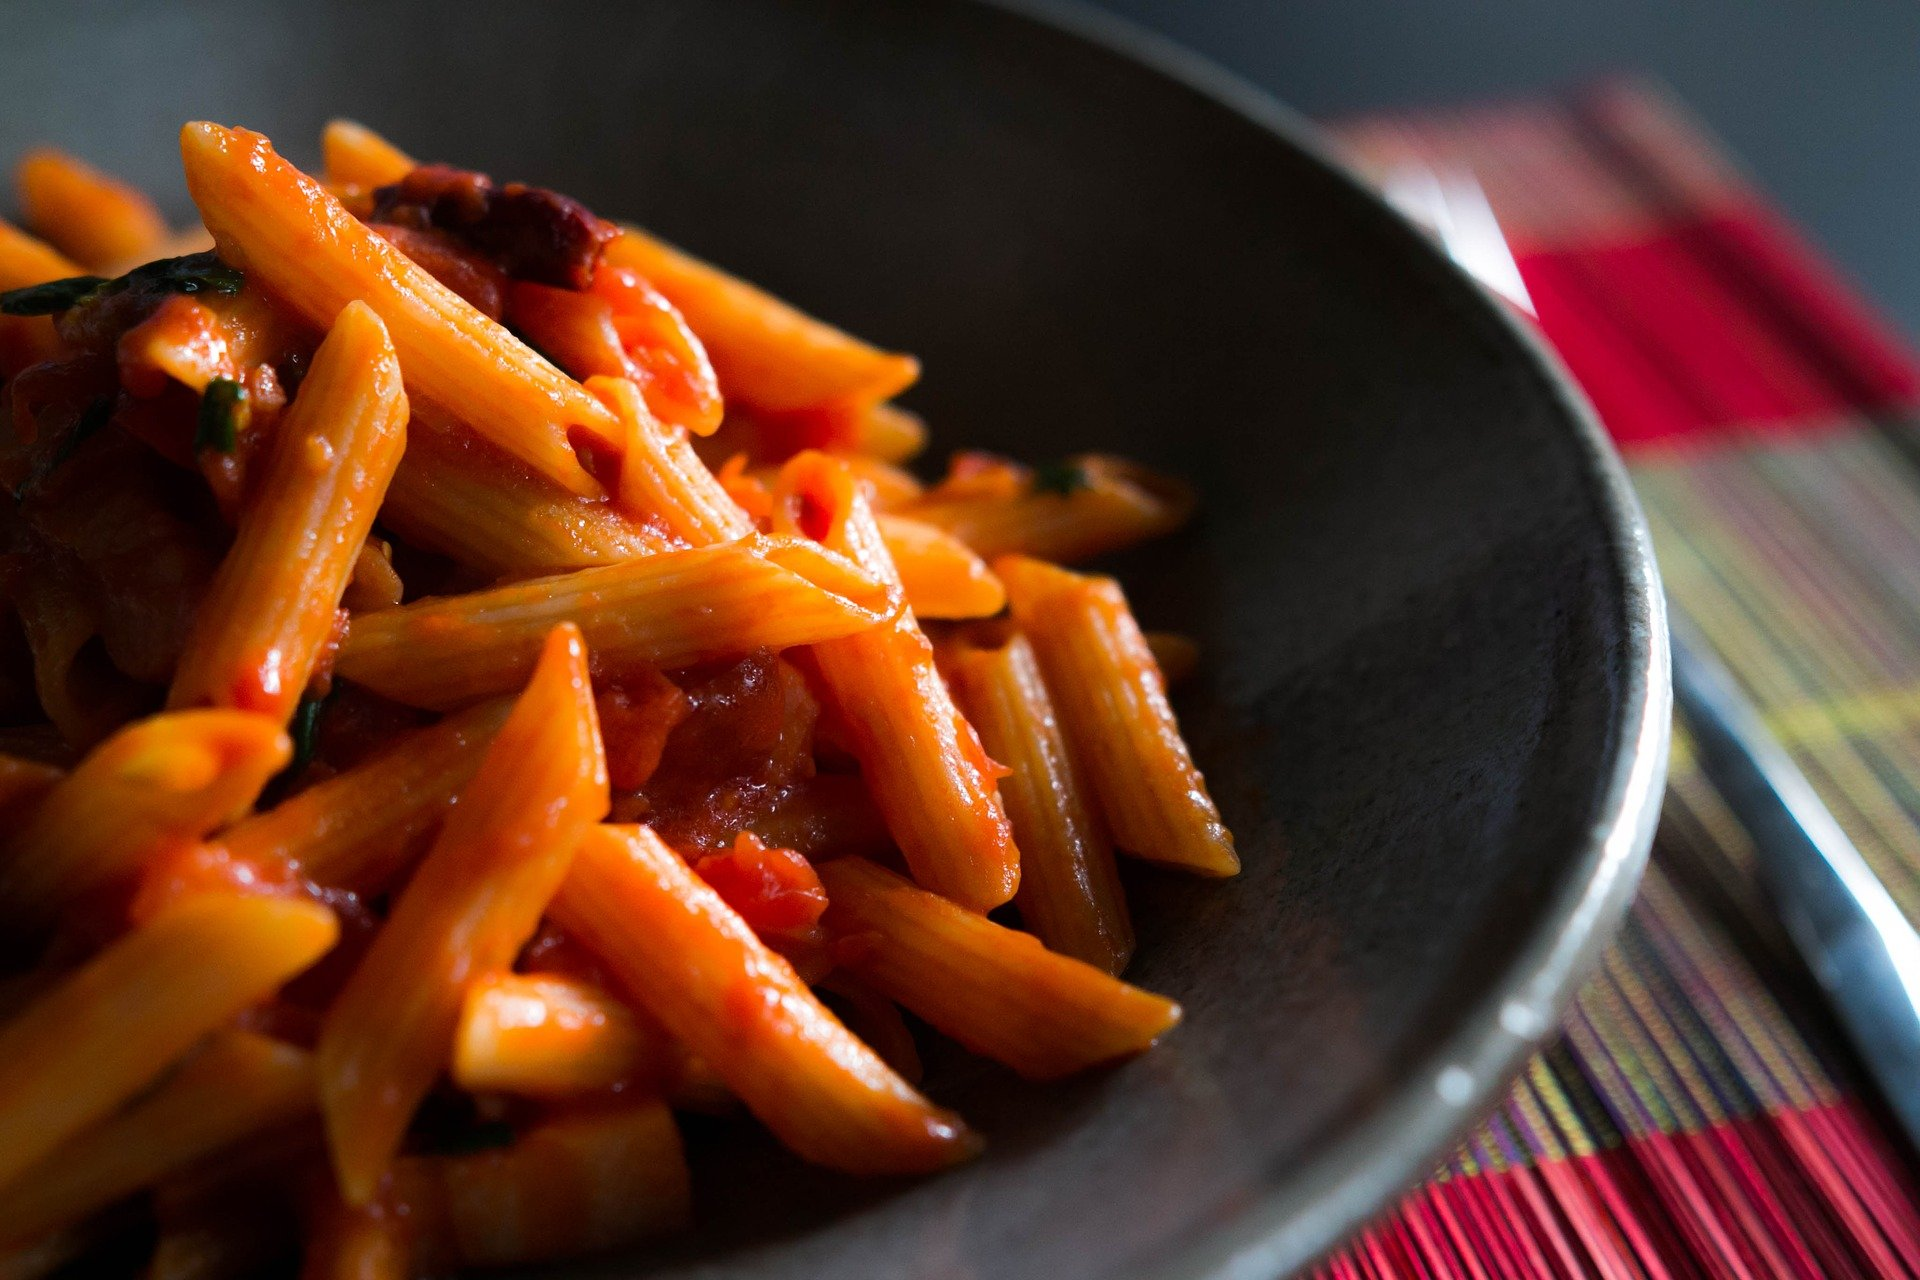 pasta 2142229 1920.jpg?resize=412,232 - 木村文乃のインスタグラムのご飯が美味しそうすぎて、旦那さんが羨ましい。